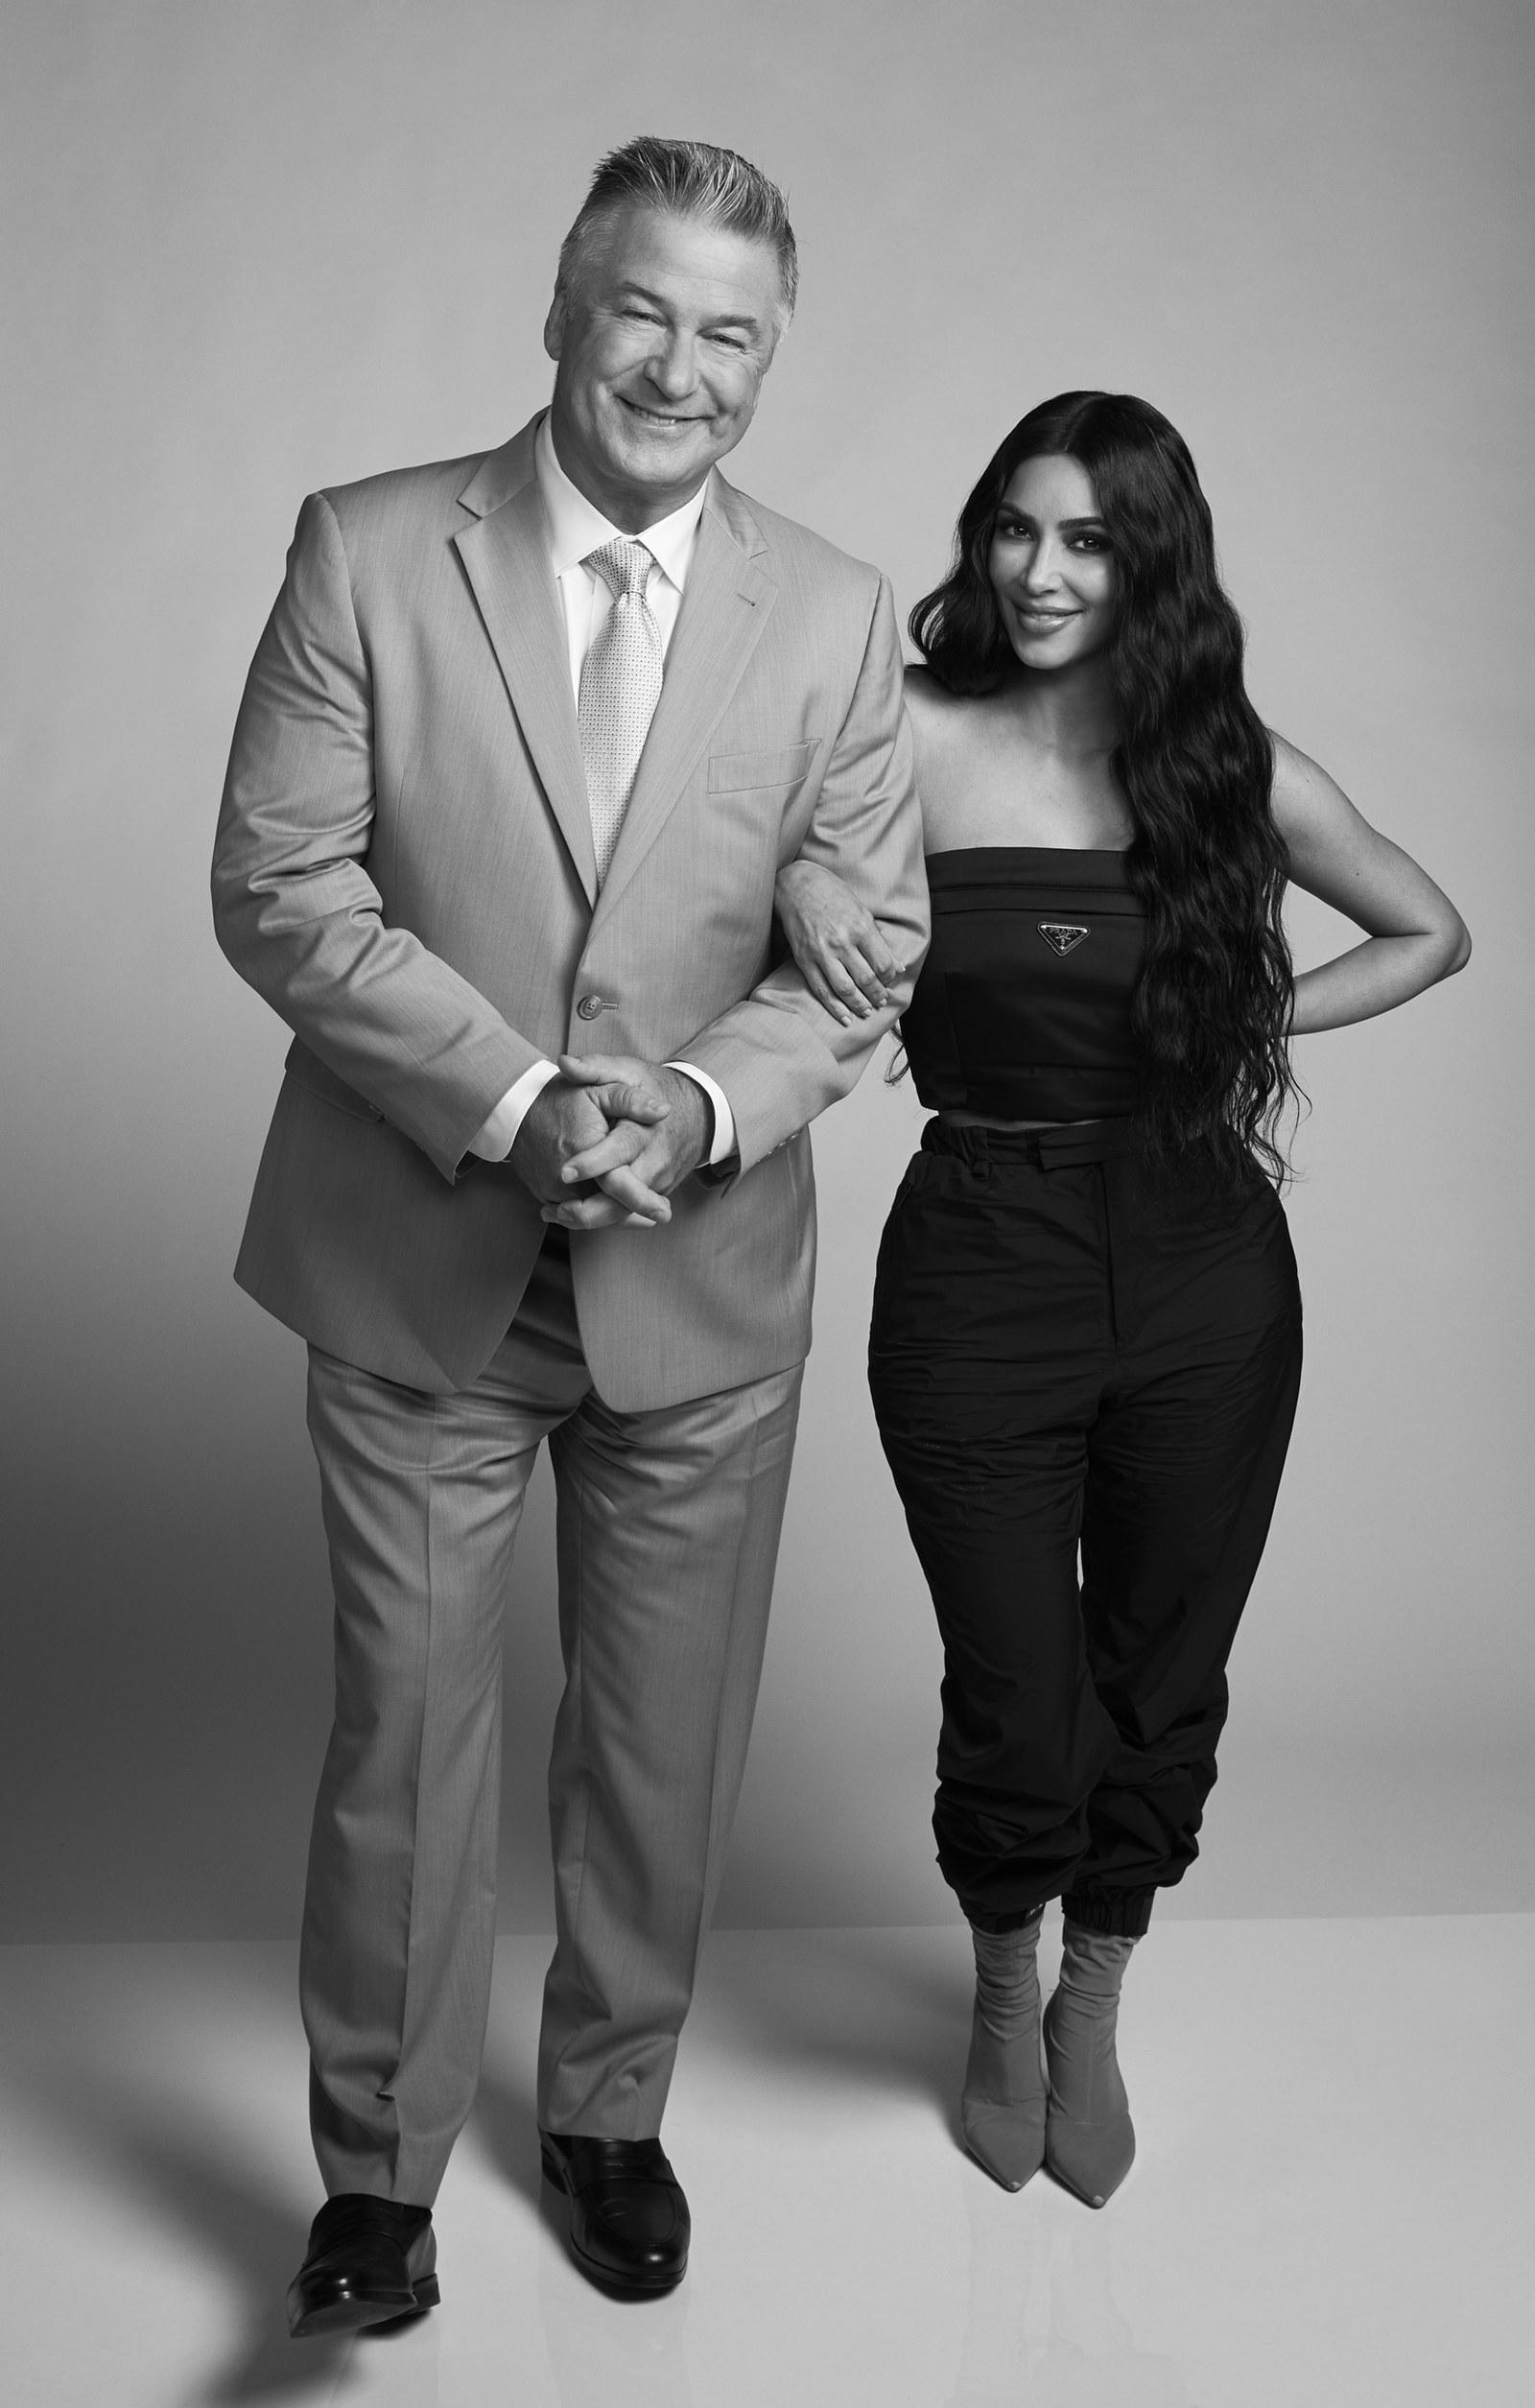 Kim Kardashian West And Alec Baldwin Stumble Through A Talk About Caitlyn Jenner